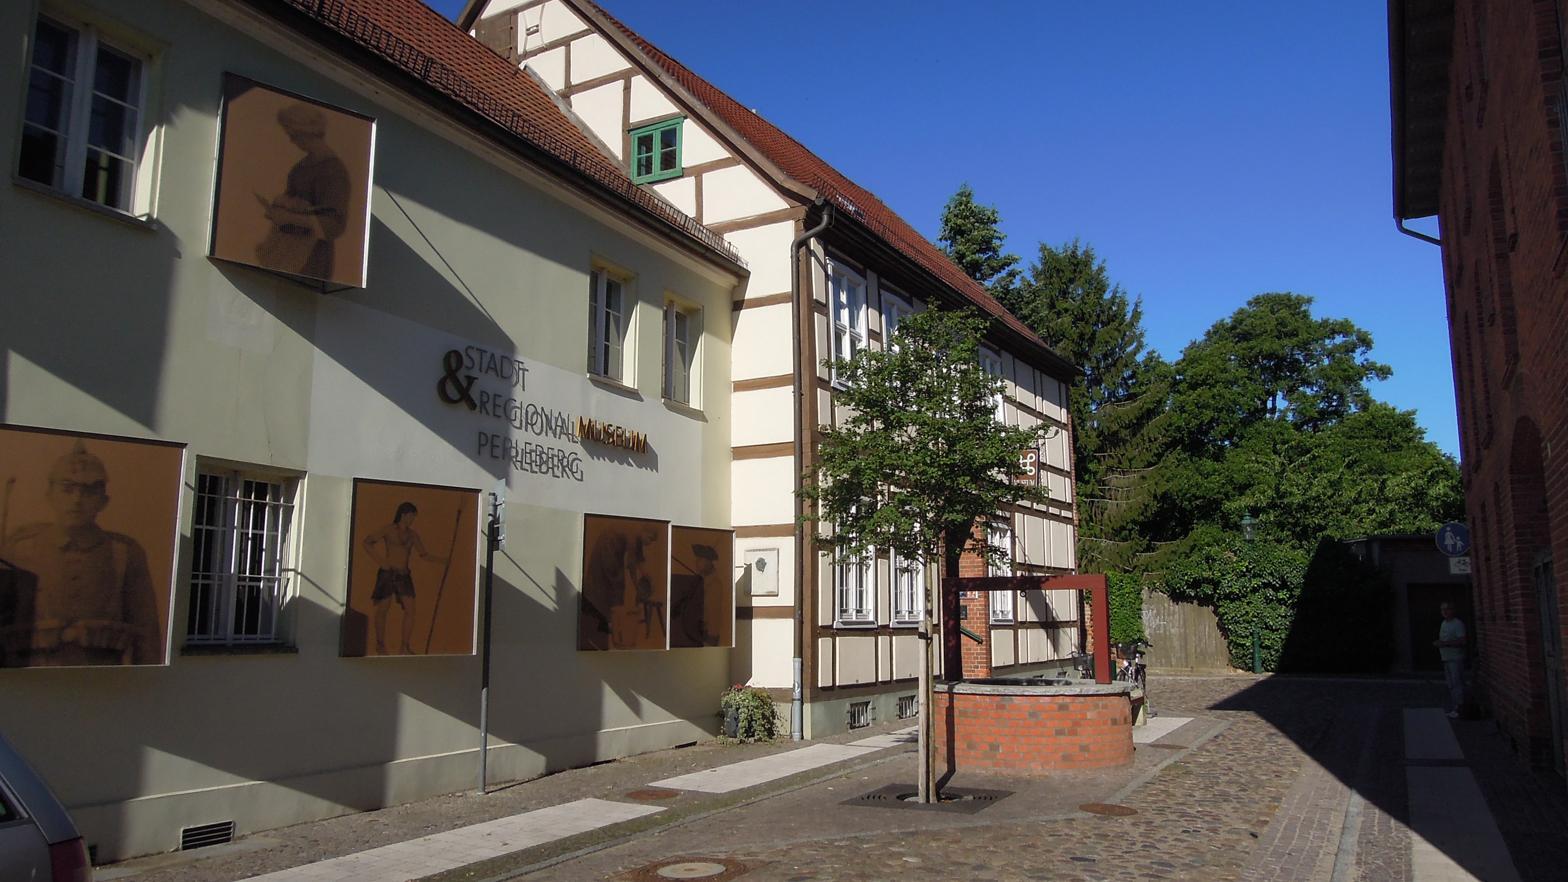 Foto: Stadt Perleberg/Stadt- und Regionalmuseum Perleberg